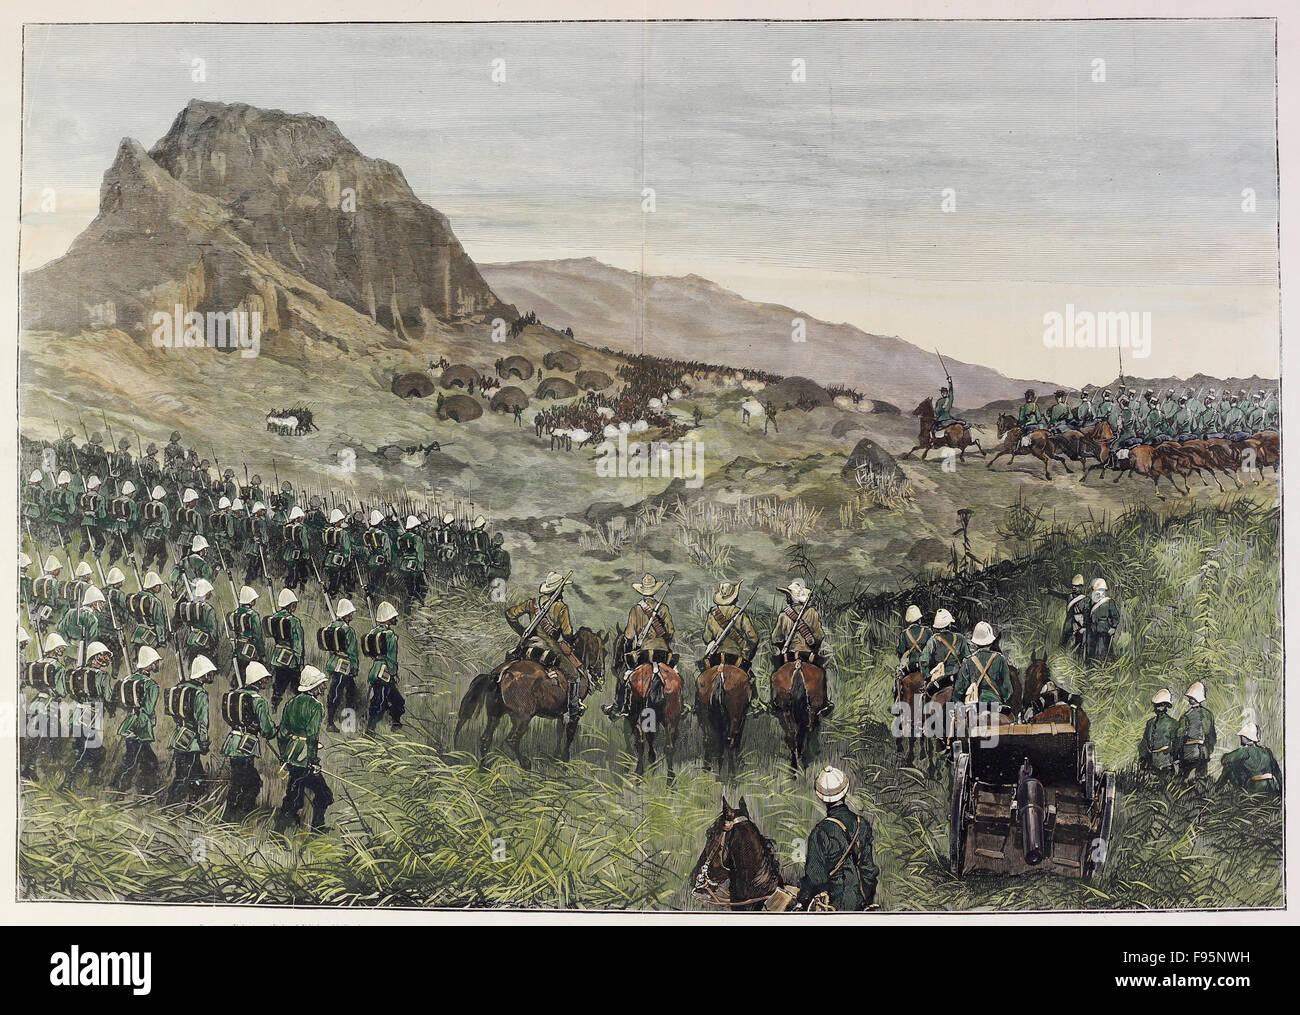 The war In Basutoland. - Stock Image